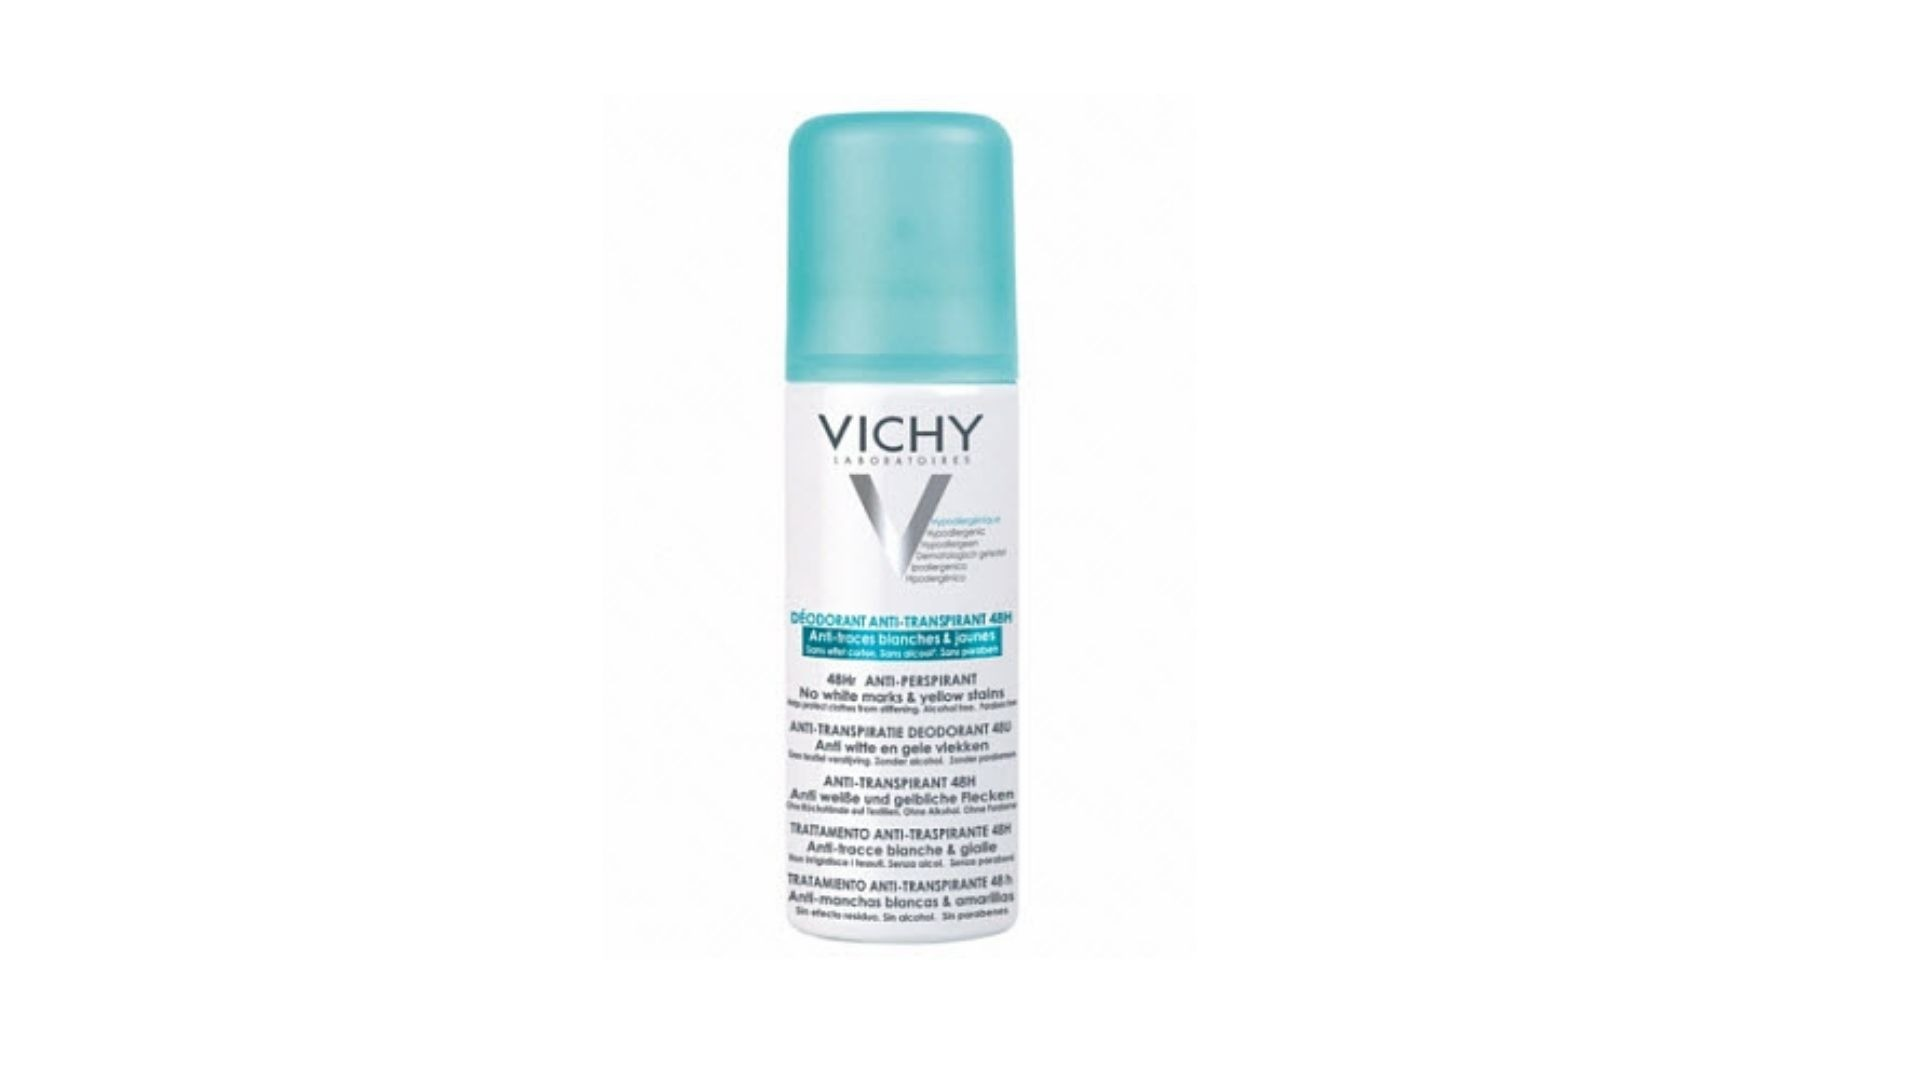 Дезодорант-антиперспирант против белых и желтых пятен 48H Anti-Perspirant, Vichy